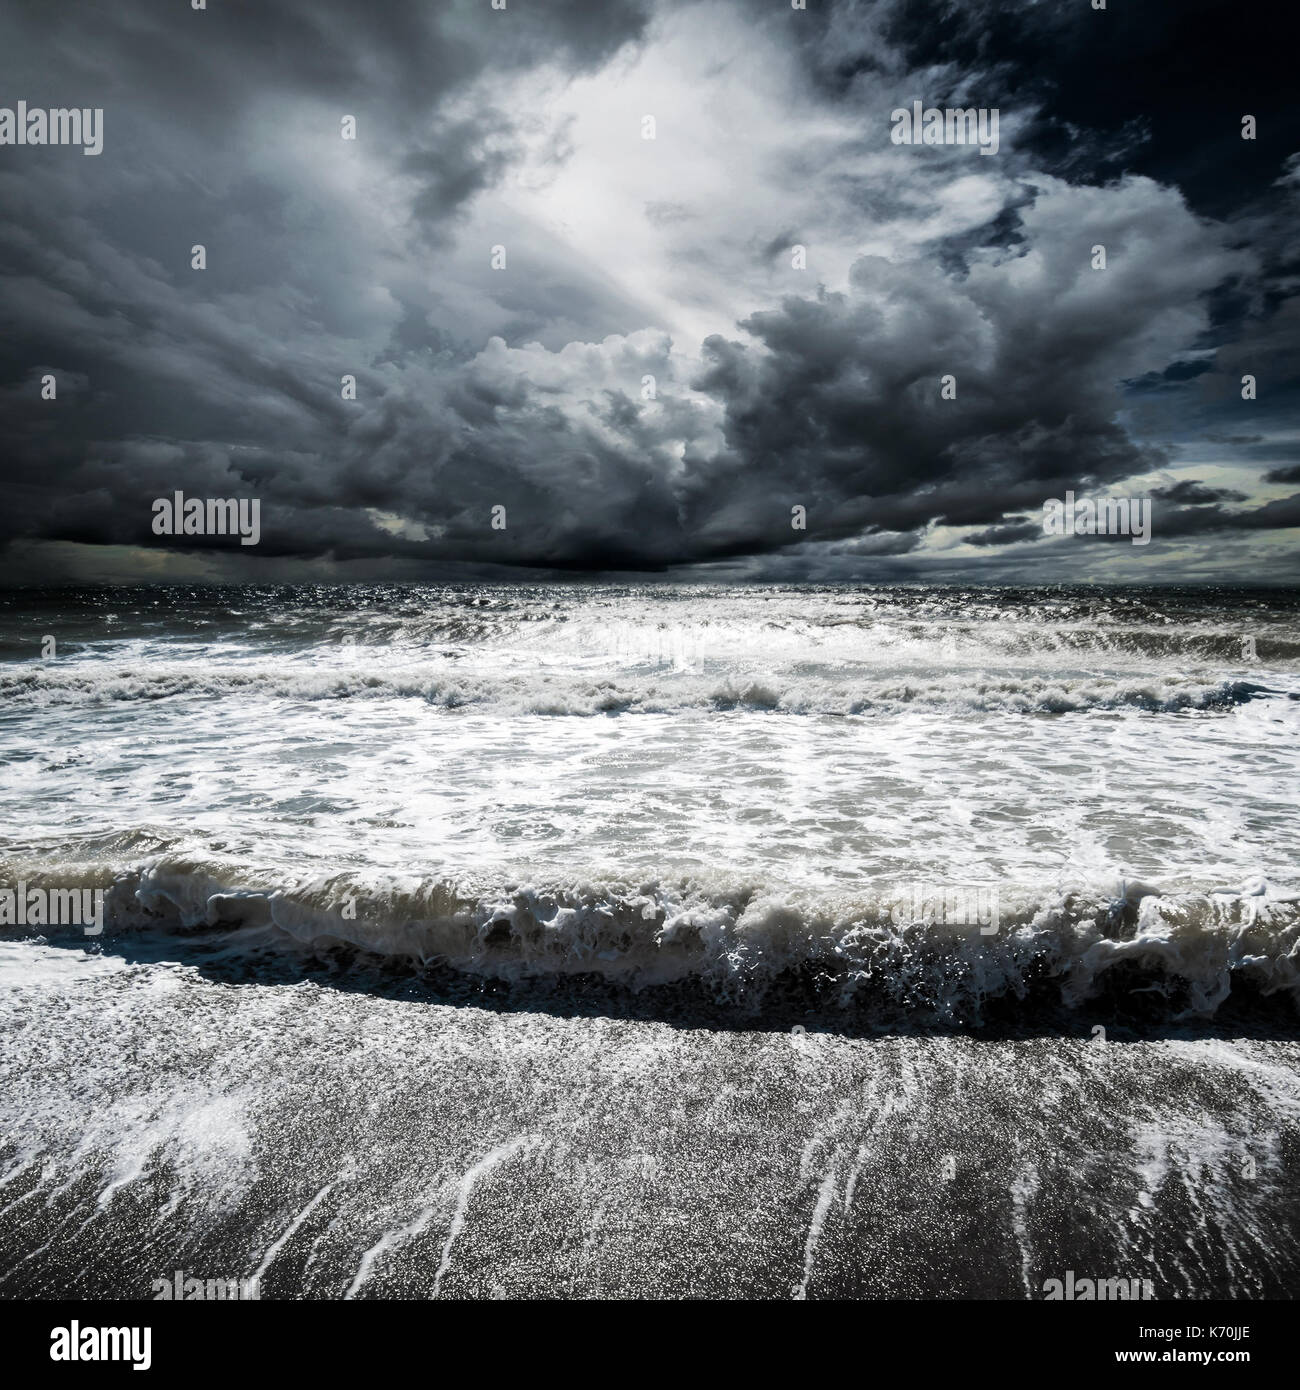 Ocean waves hurricane - Stock Image